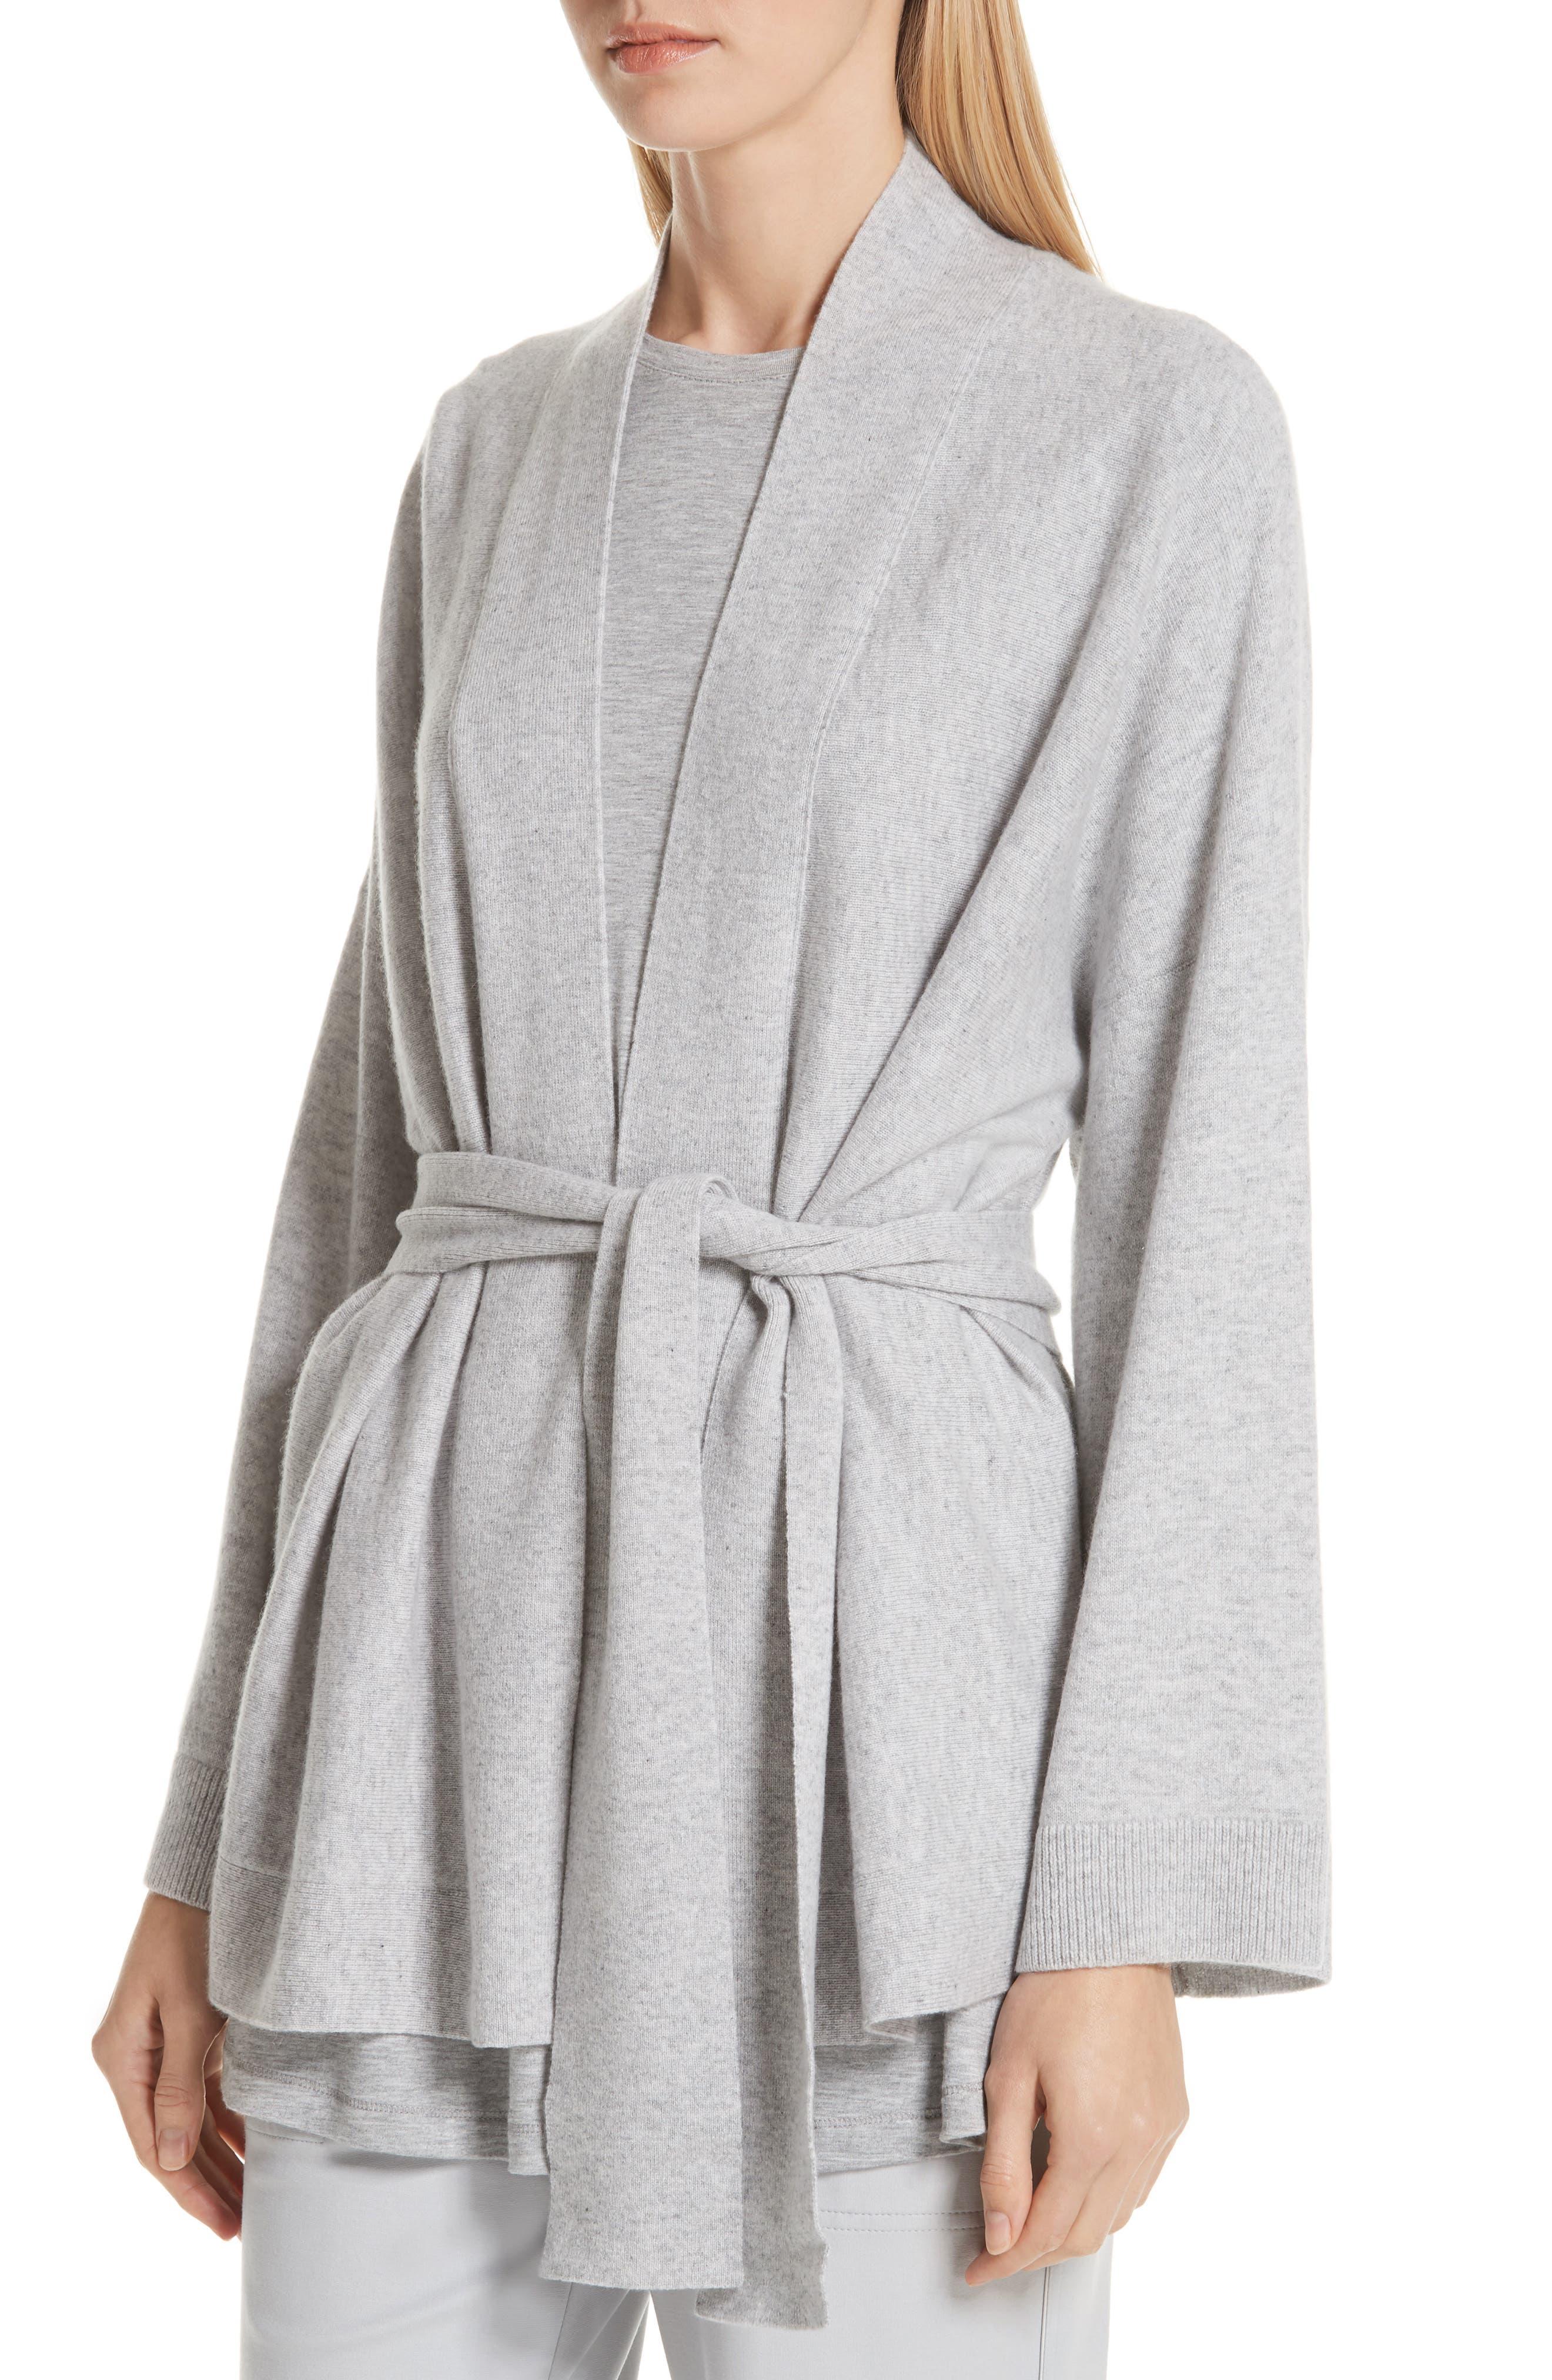 Cashmere Kimono Cardigan,                             Alternate thumbnail 4, color,                             GREY HEATHER